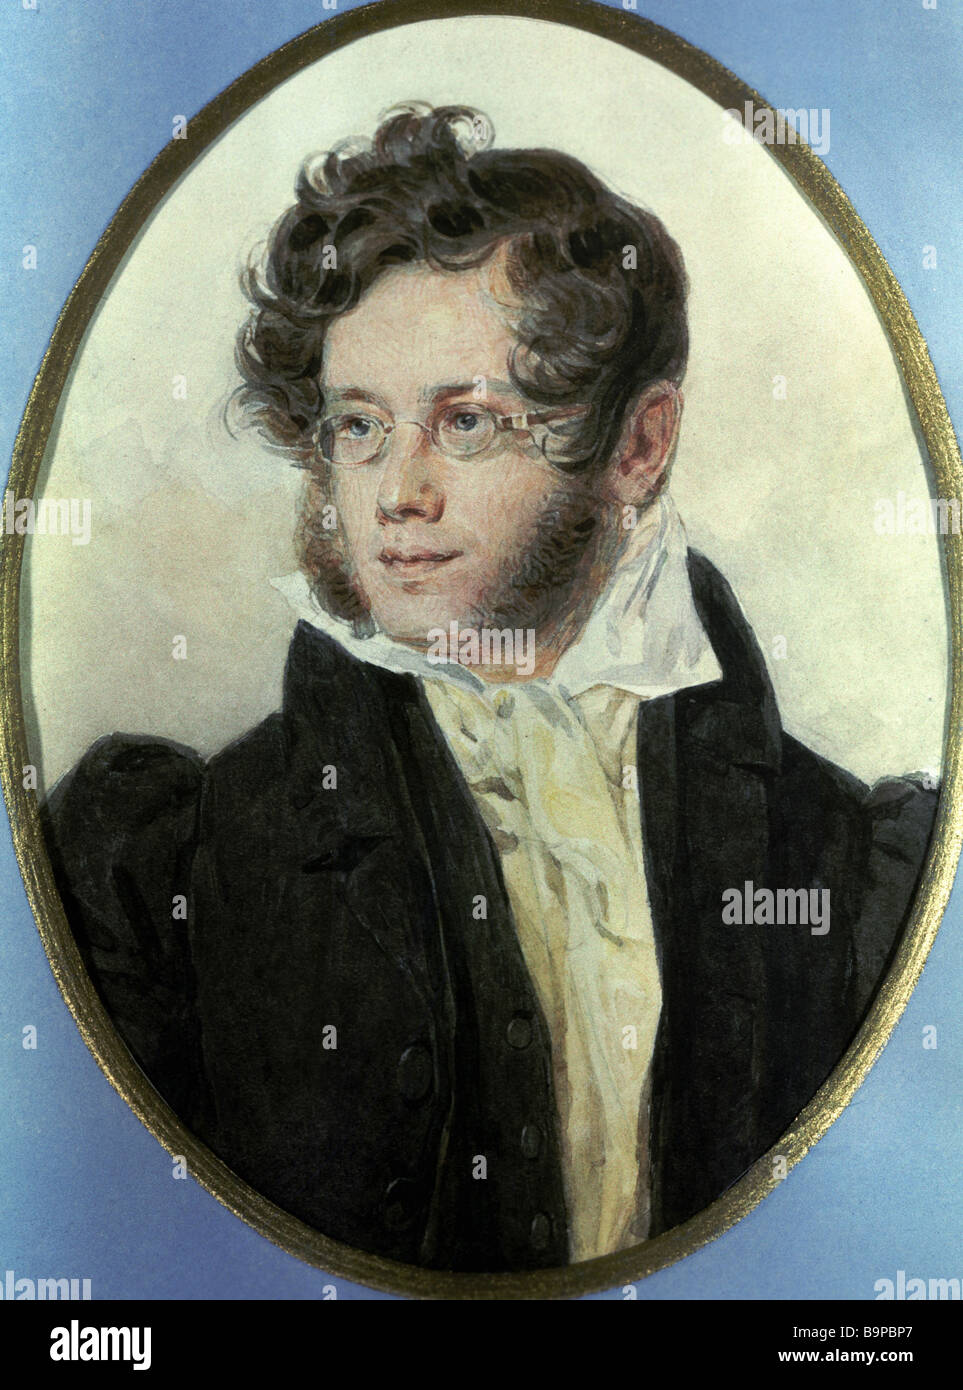 Piotr Sokolov Acuarela retrato del poeta ruso del siglo XIX, Piotr Vyazemsky Imagen De Stock